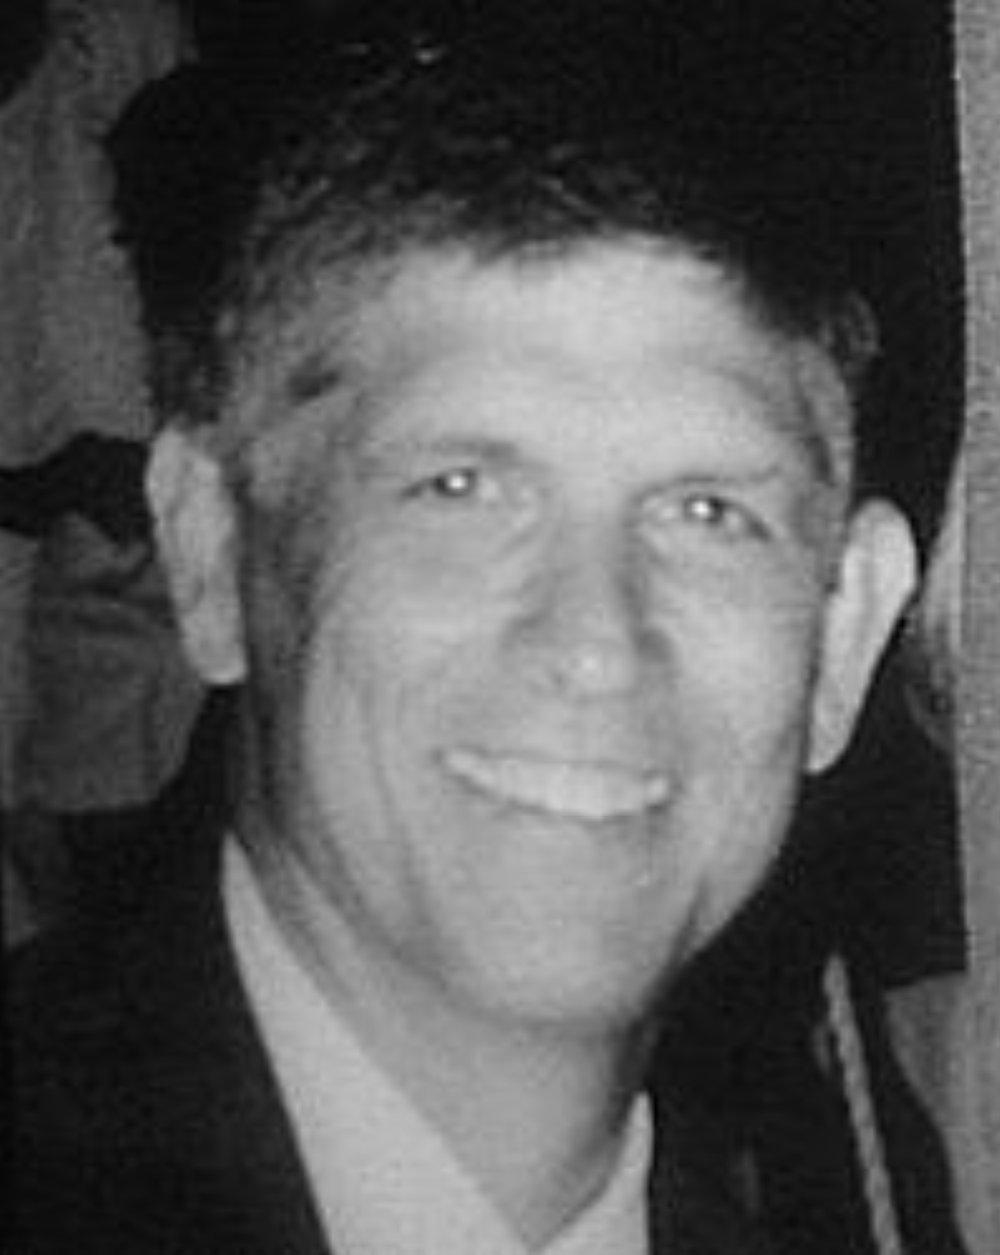 JOHN W. SUTHERLAND, JR.